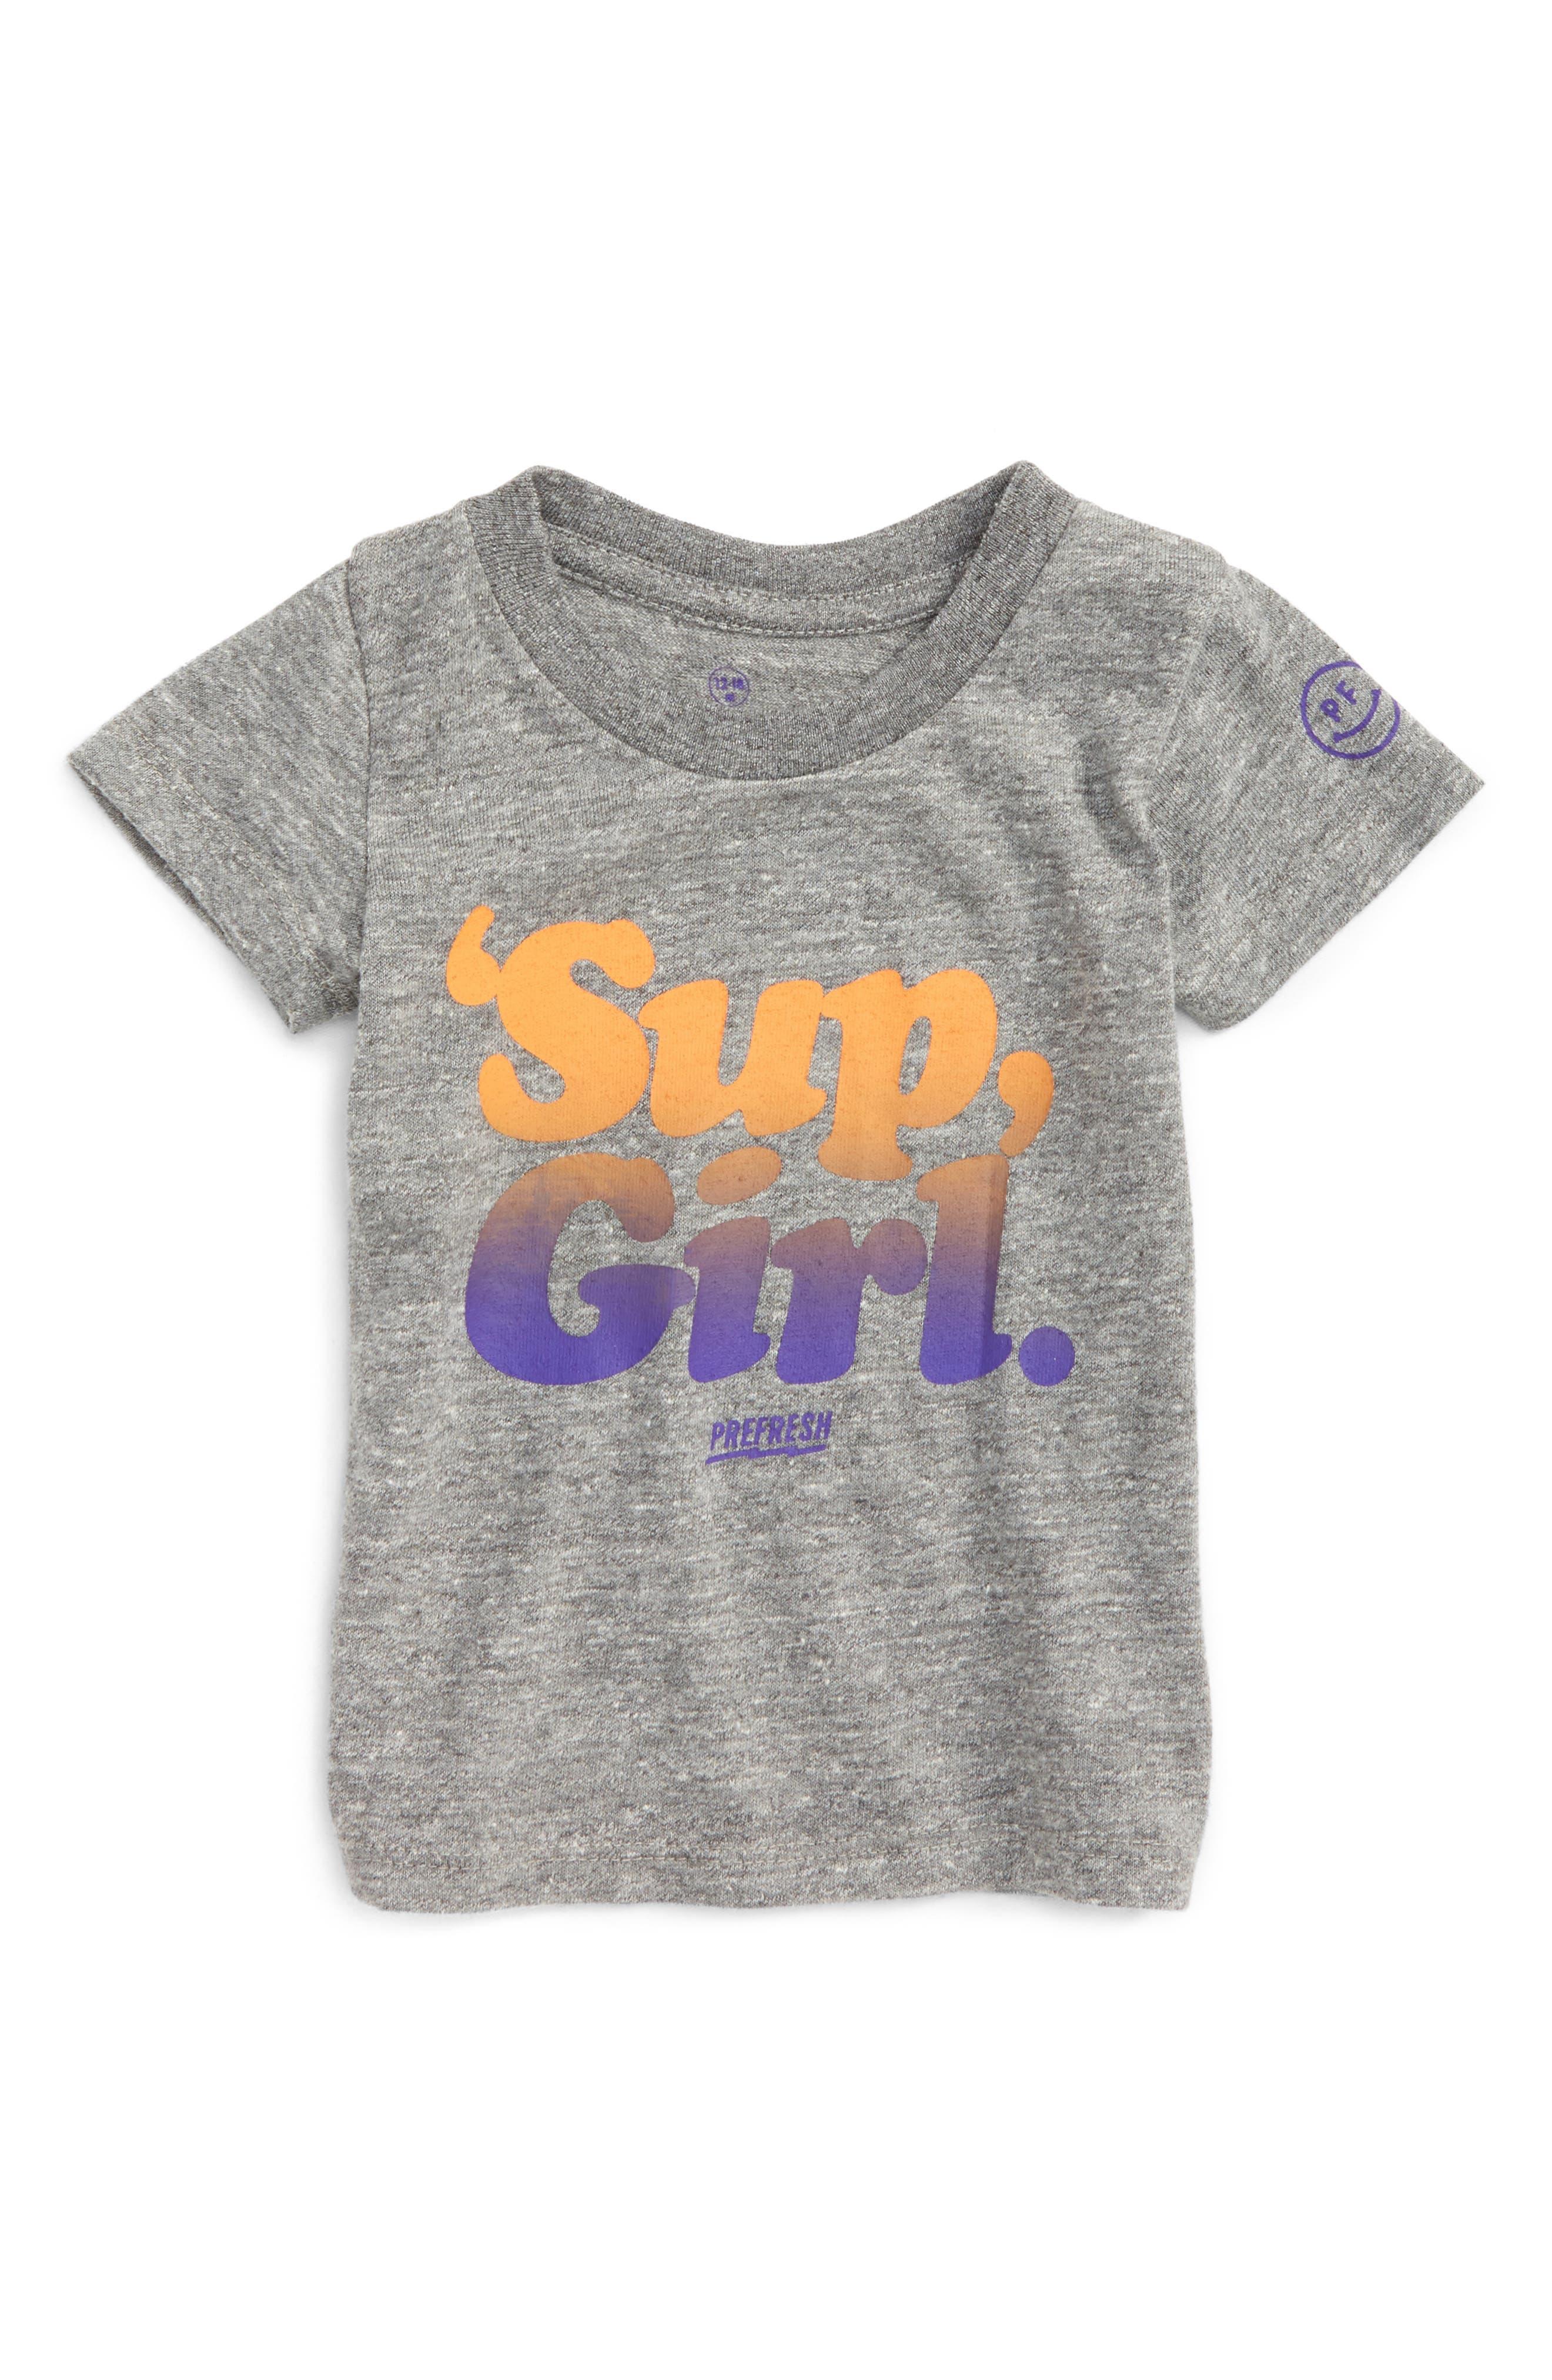 Main Image - Prefresh 'Sup, Girl Graphic T-Shirt (Baby Boys)